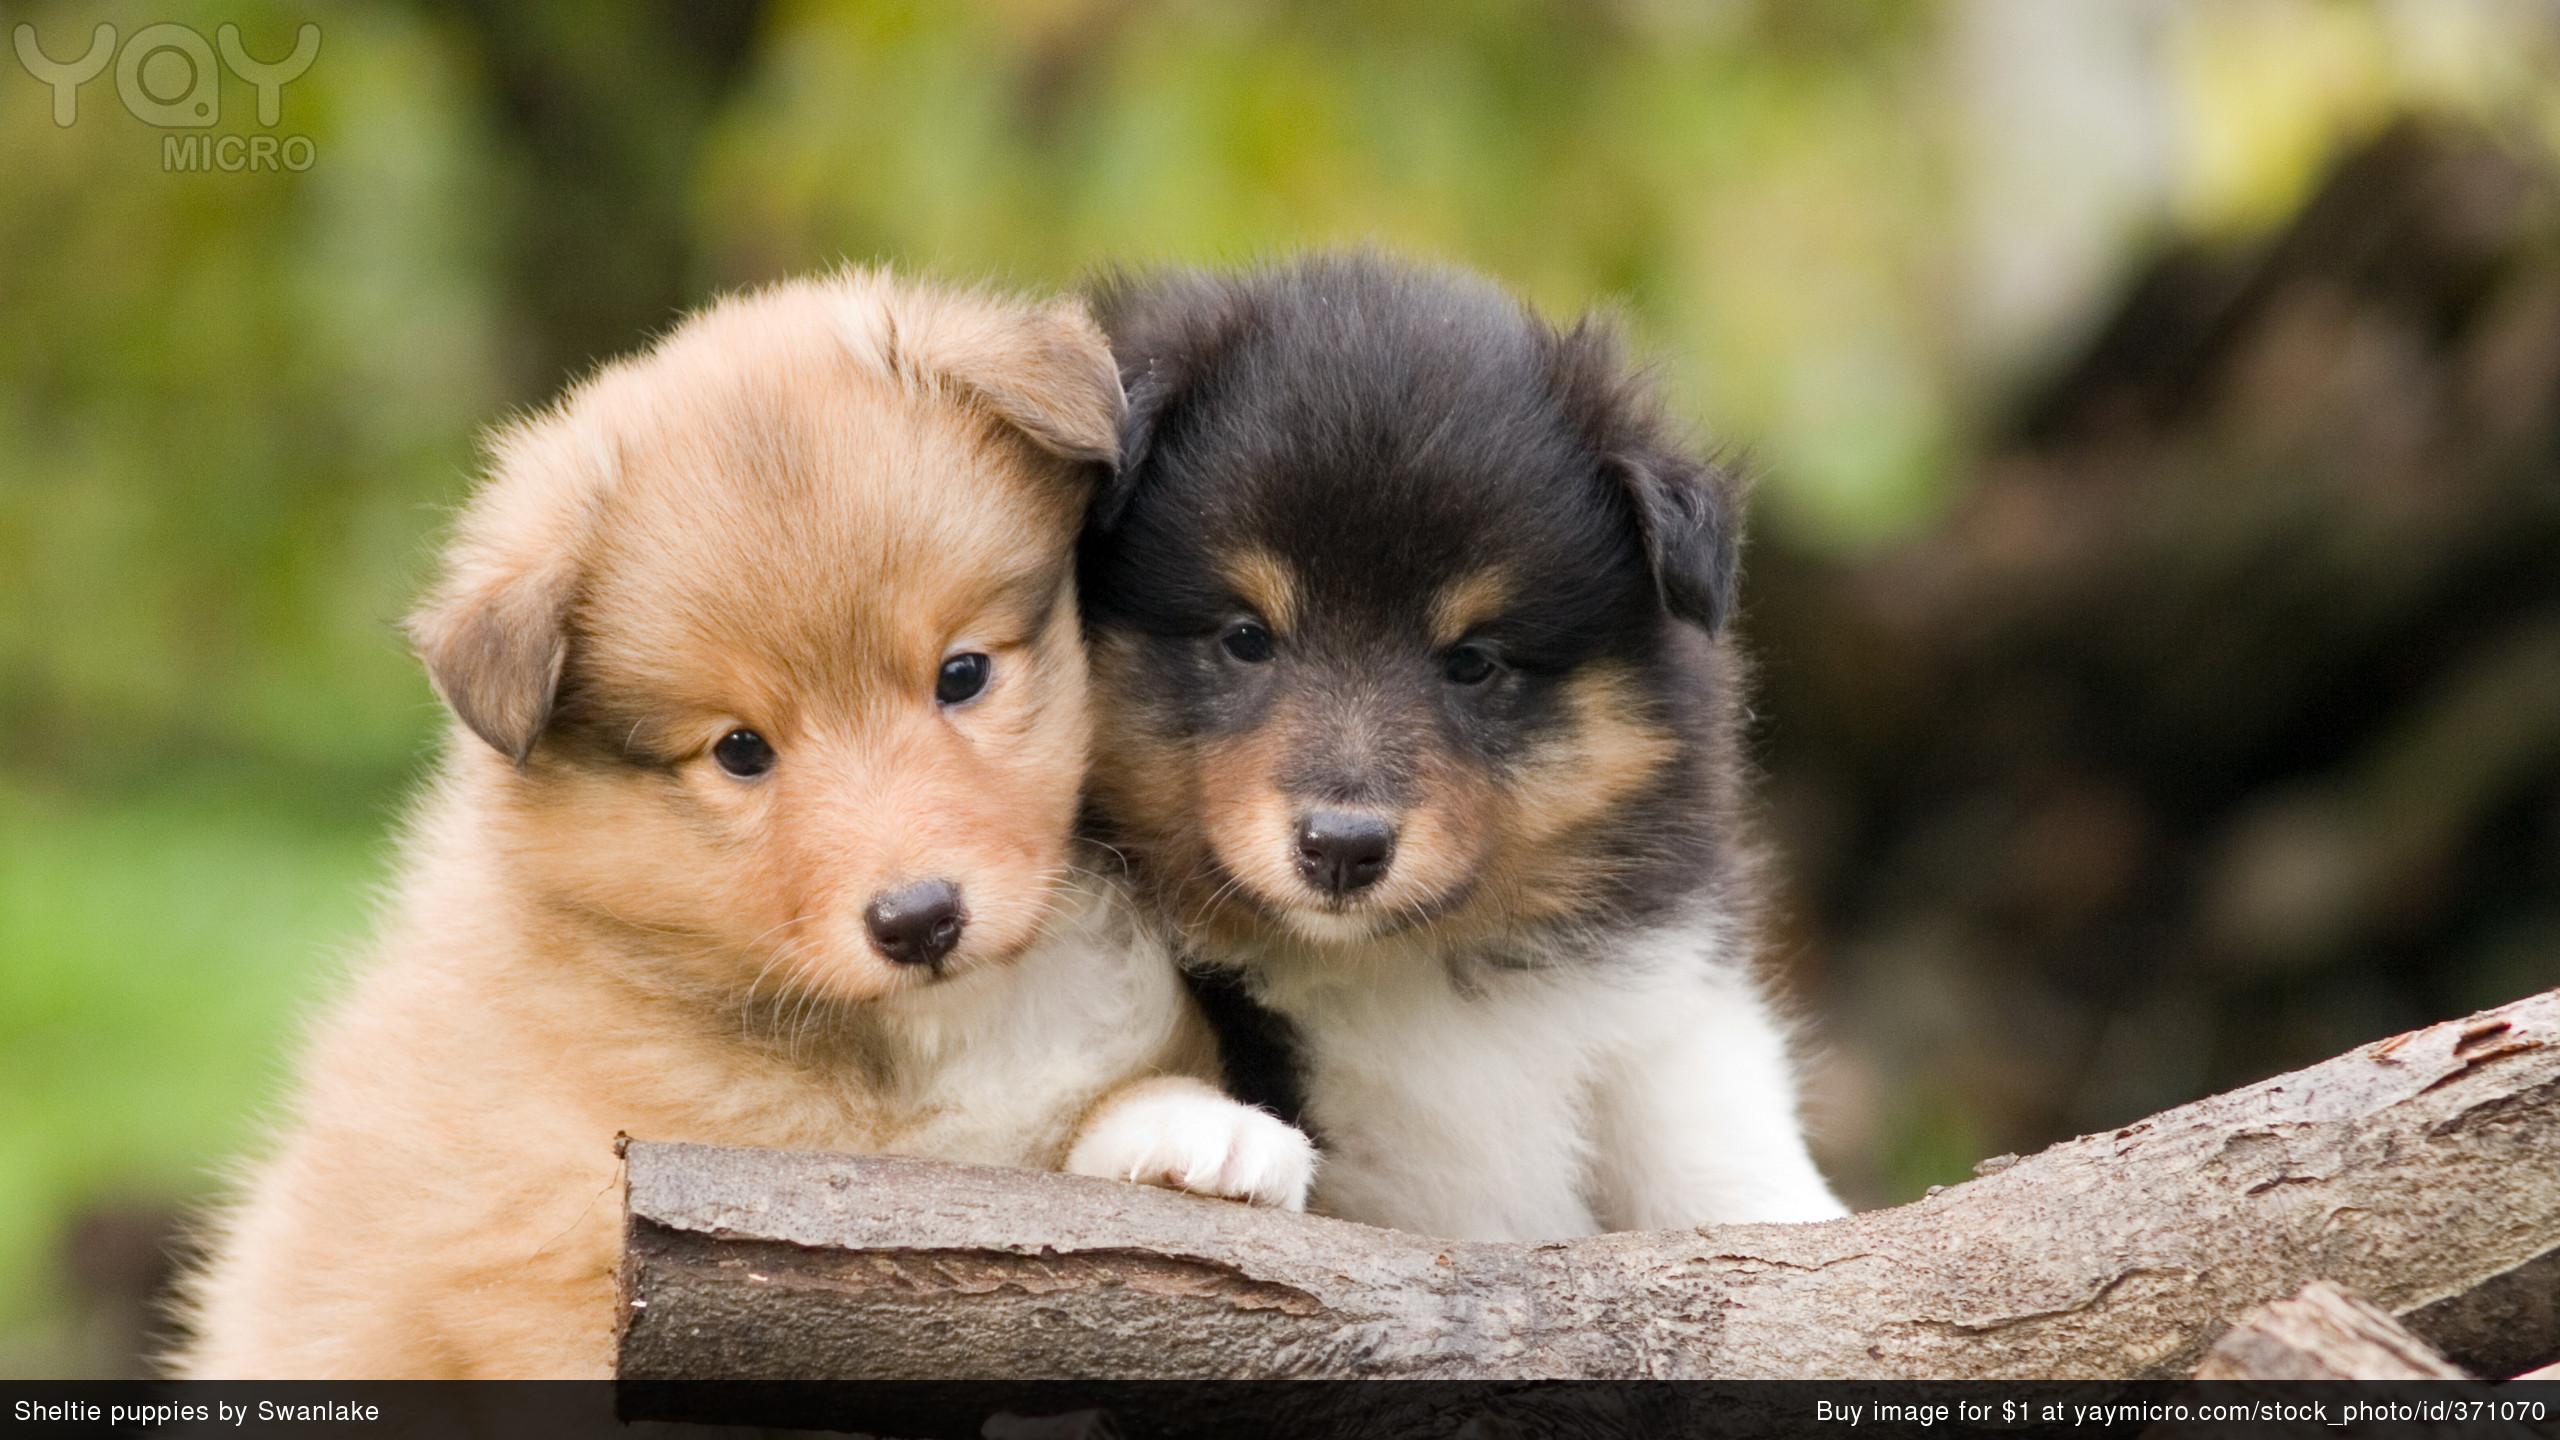 Cute Puppy Desktop Wallpaper 53 Pictures